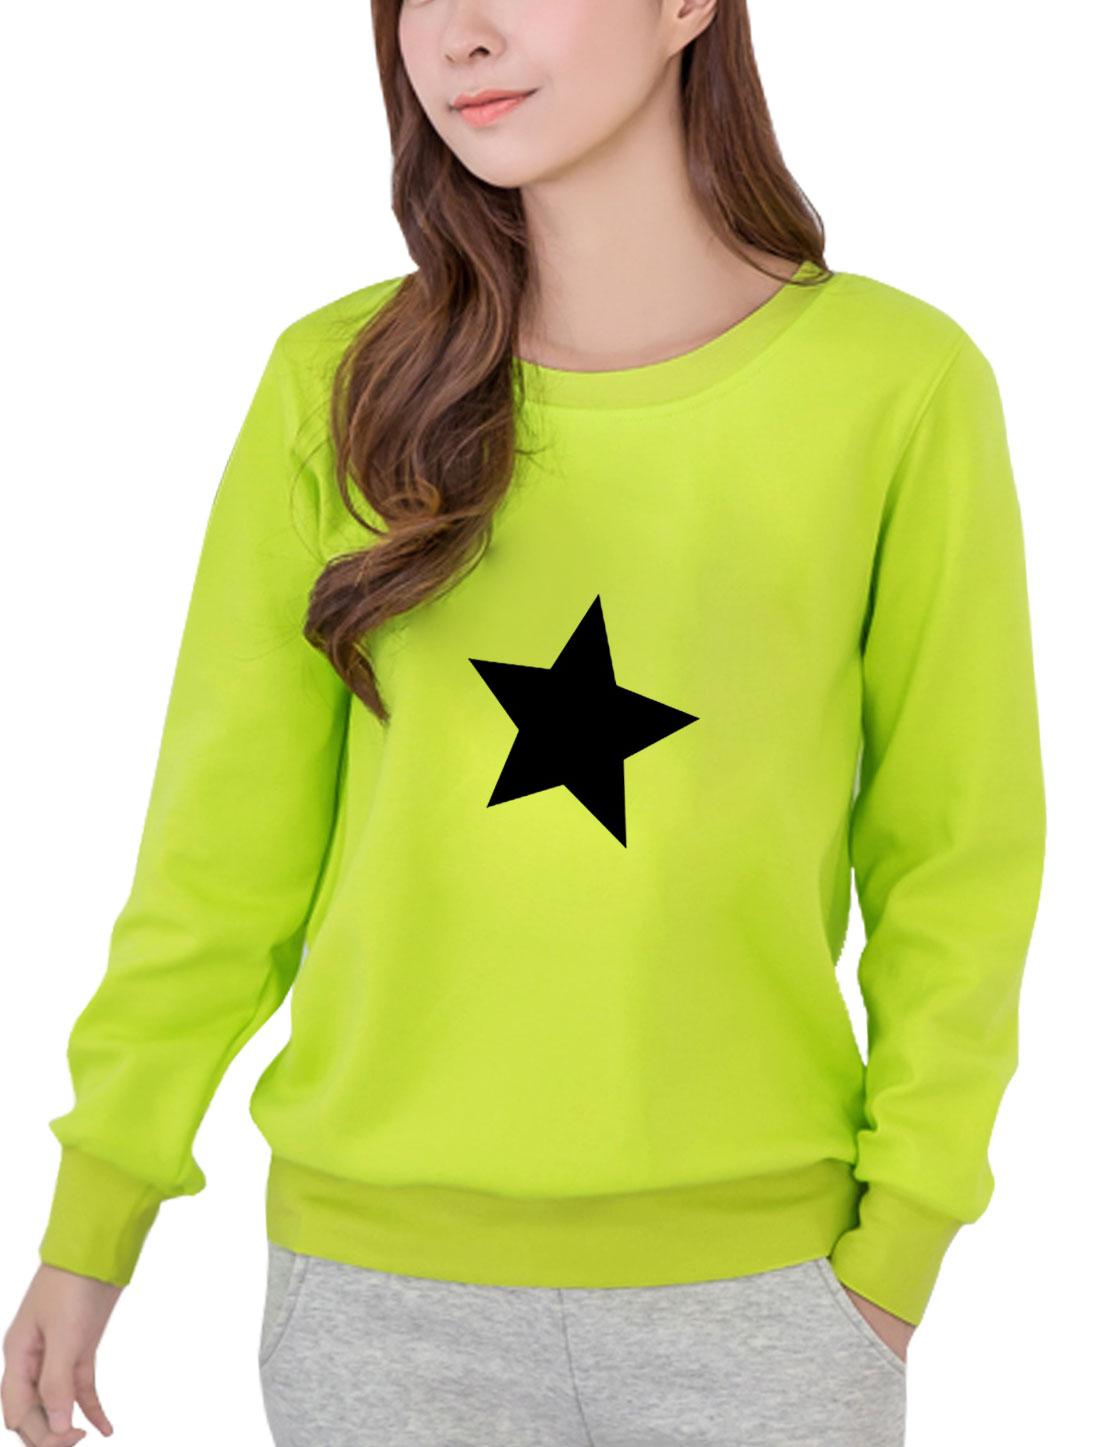 Women Round Neck Long Sleeves Stars Print Sweatshirt Lime S